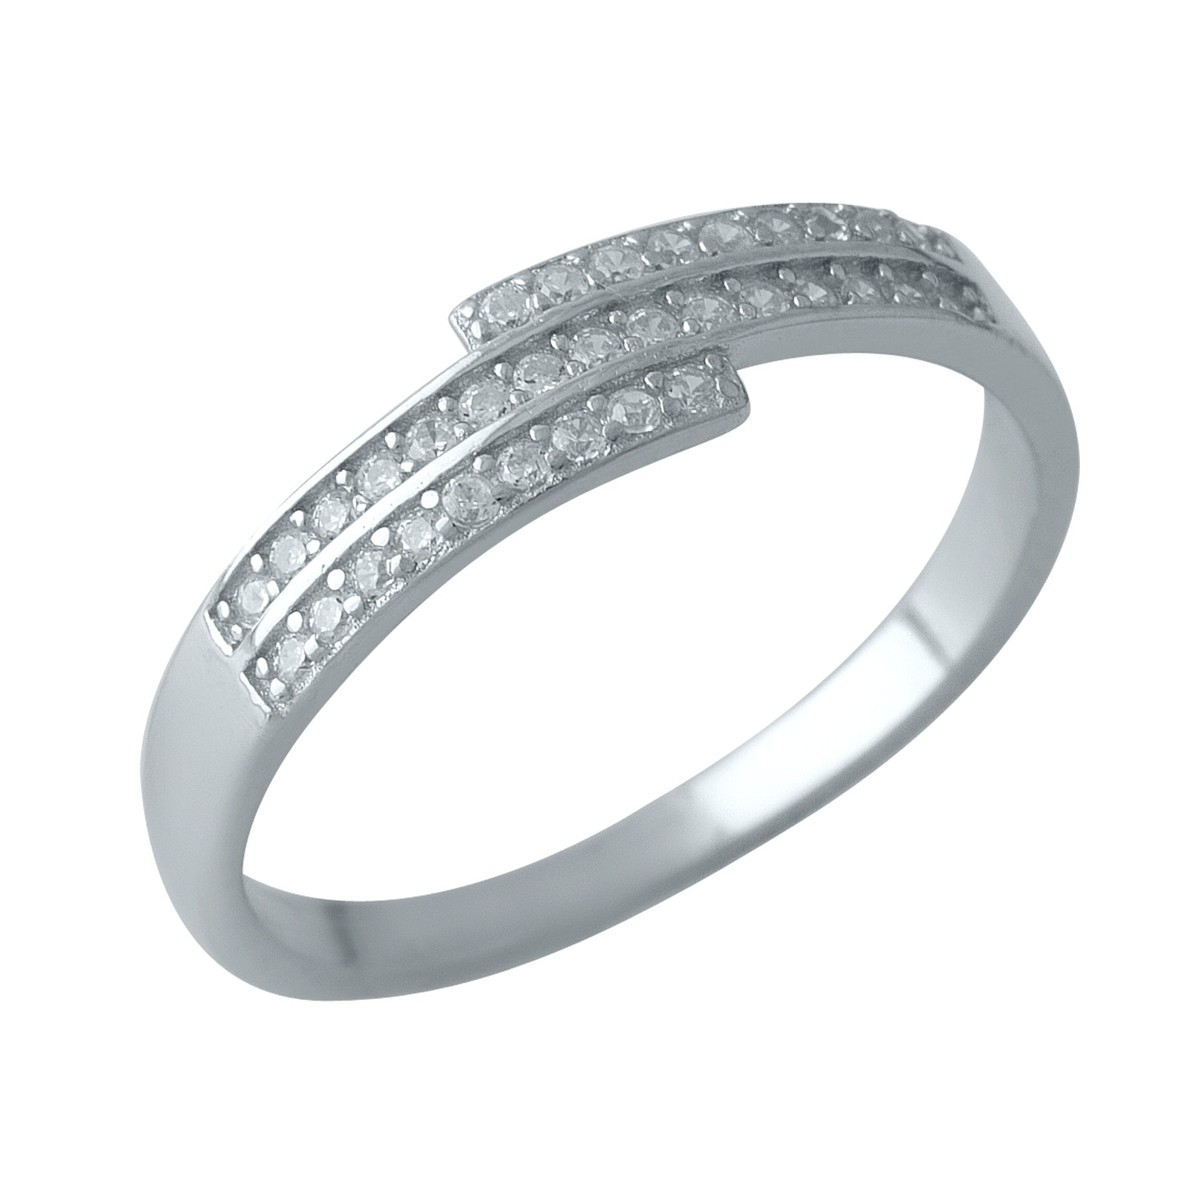 Серебряное кольцо DreamJewelry с фианитами (1999318) 18 размер